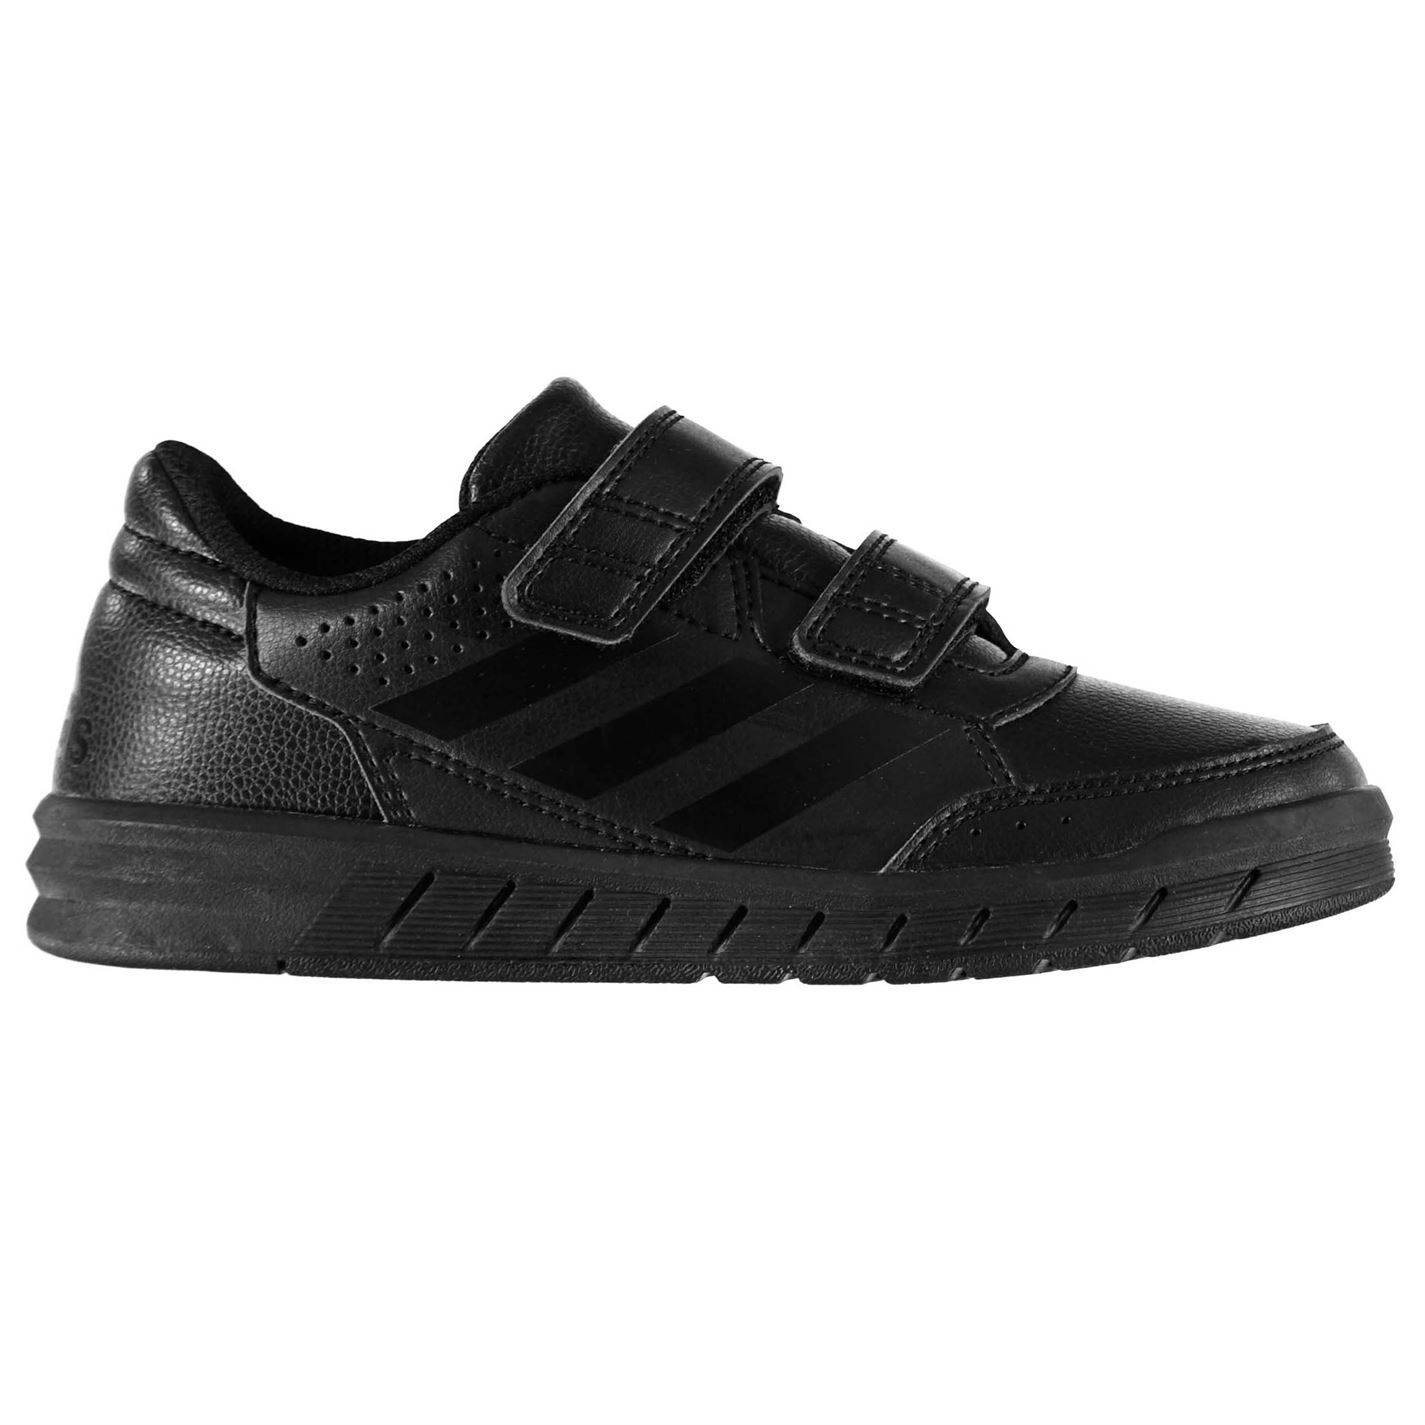 miniatura 7 - ADIDAS-alta-Sport-CF-Scarpe-da-ginnastica-bambino-ragazzo-calzature